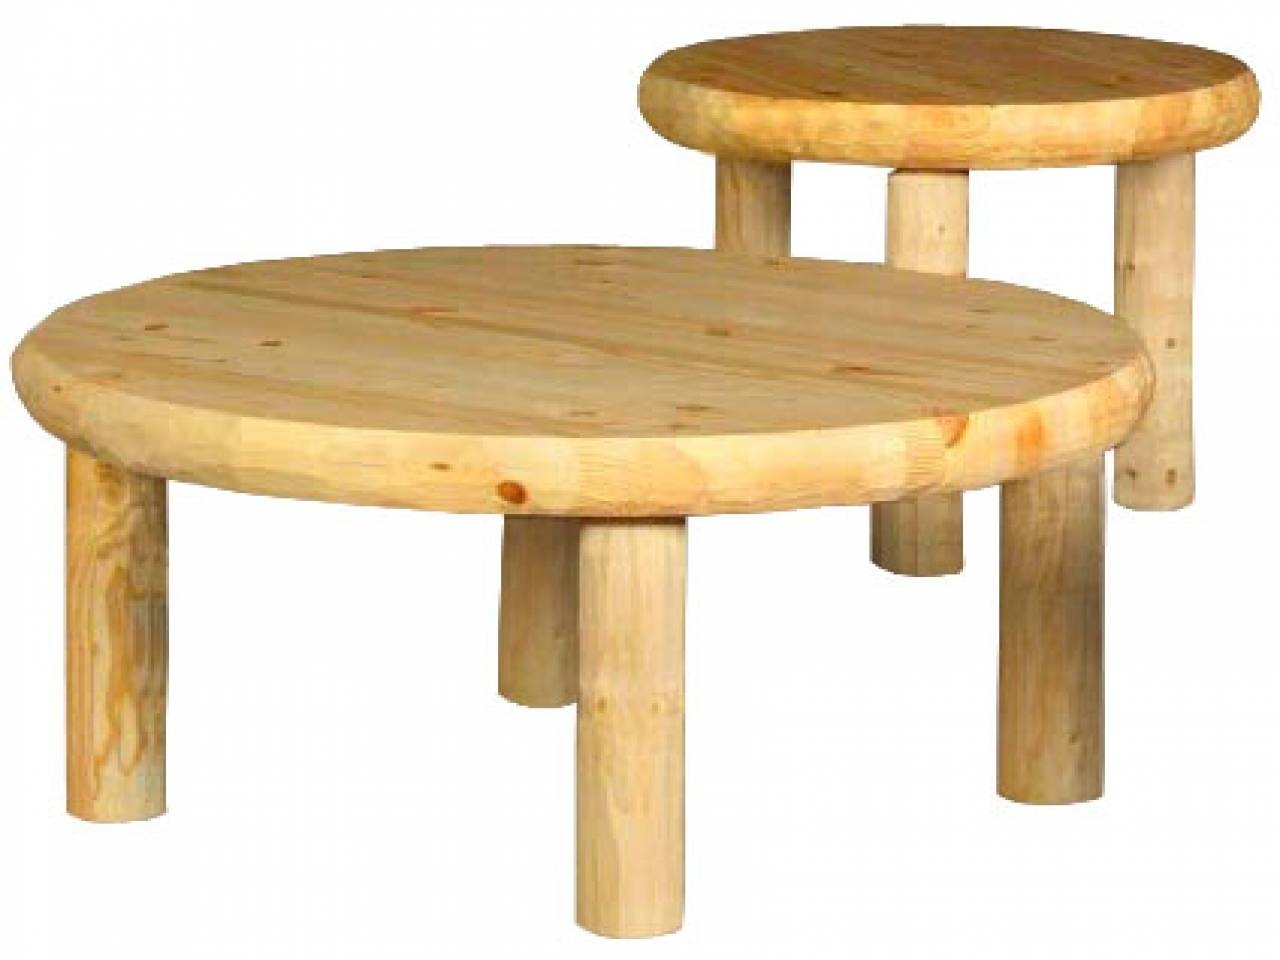 Round Pine Coffee Table - Starrkingschool intended for Round Pine Coffee Tables (Image 25 of 30)